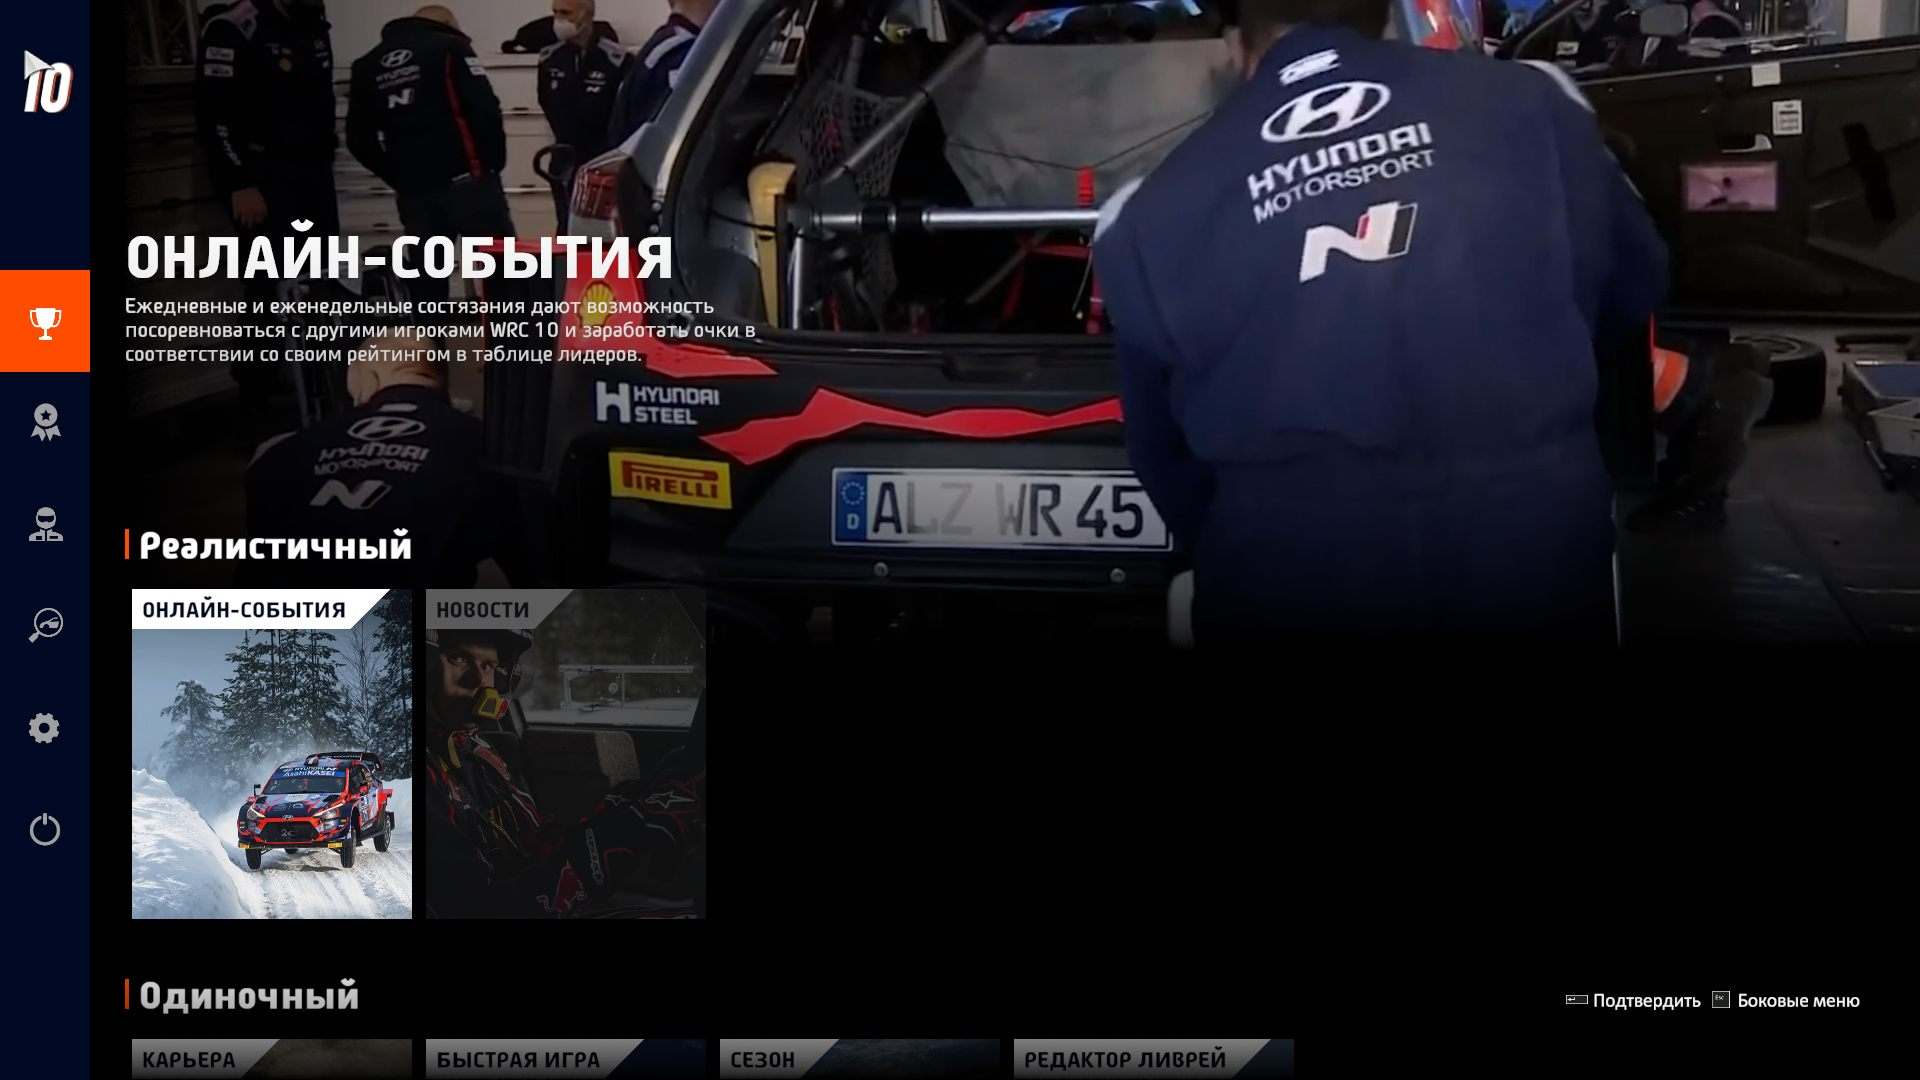 WRC10 9_3_2021 11_21_31 PM.png.jpg